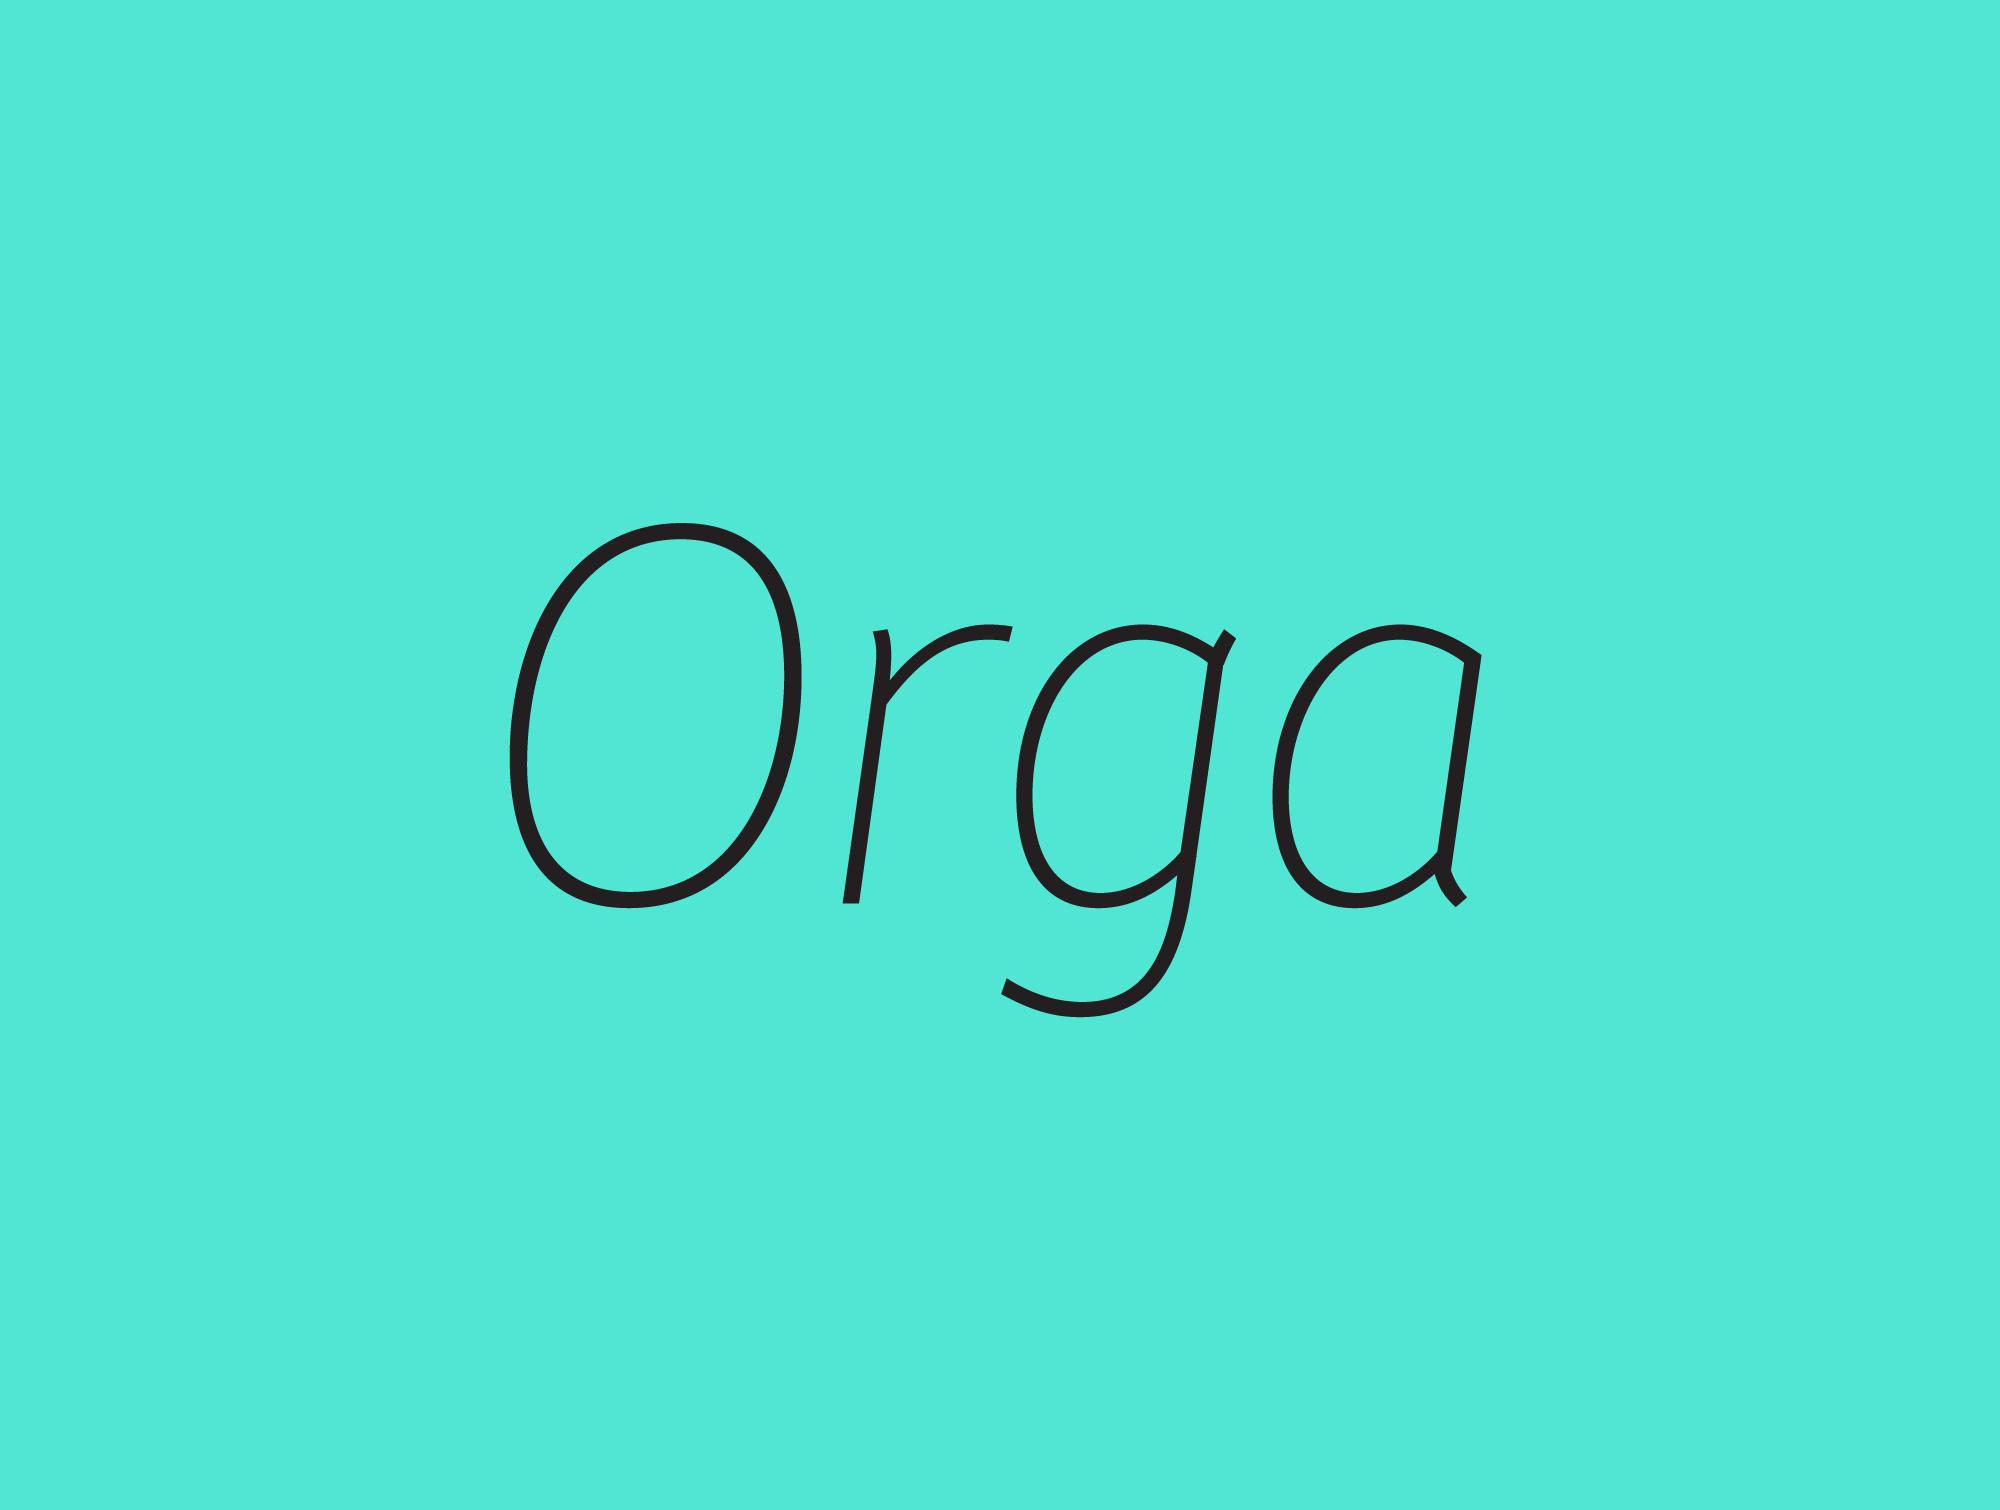 Cover image: Orga (2012)